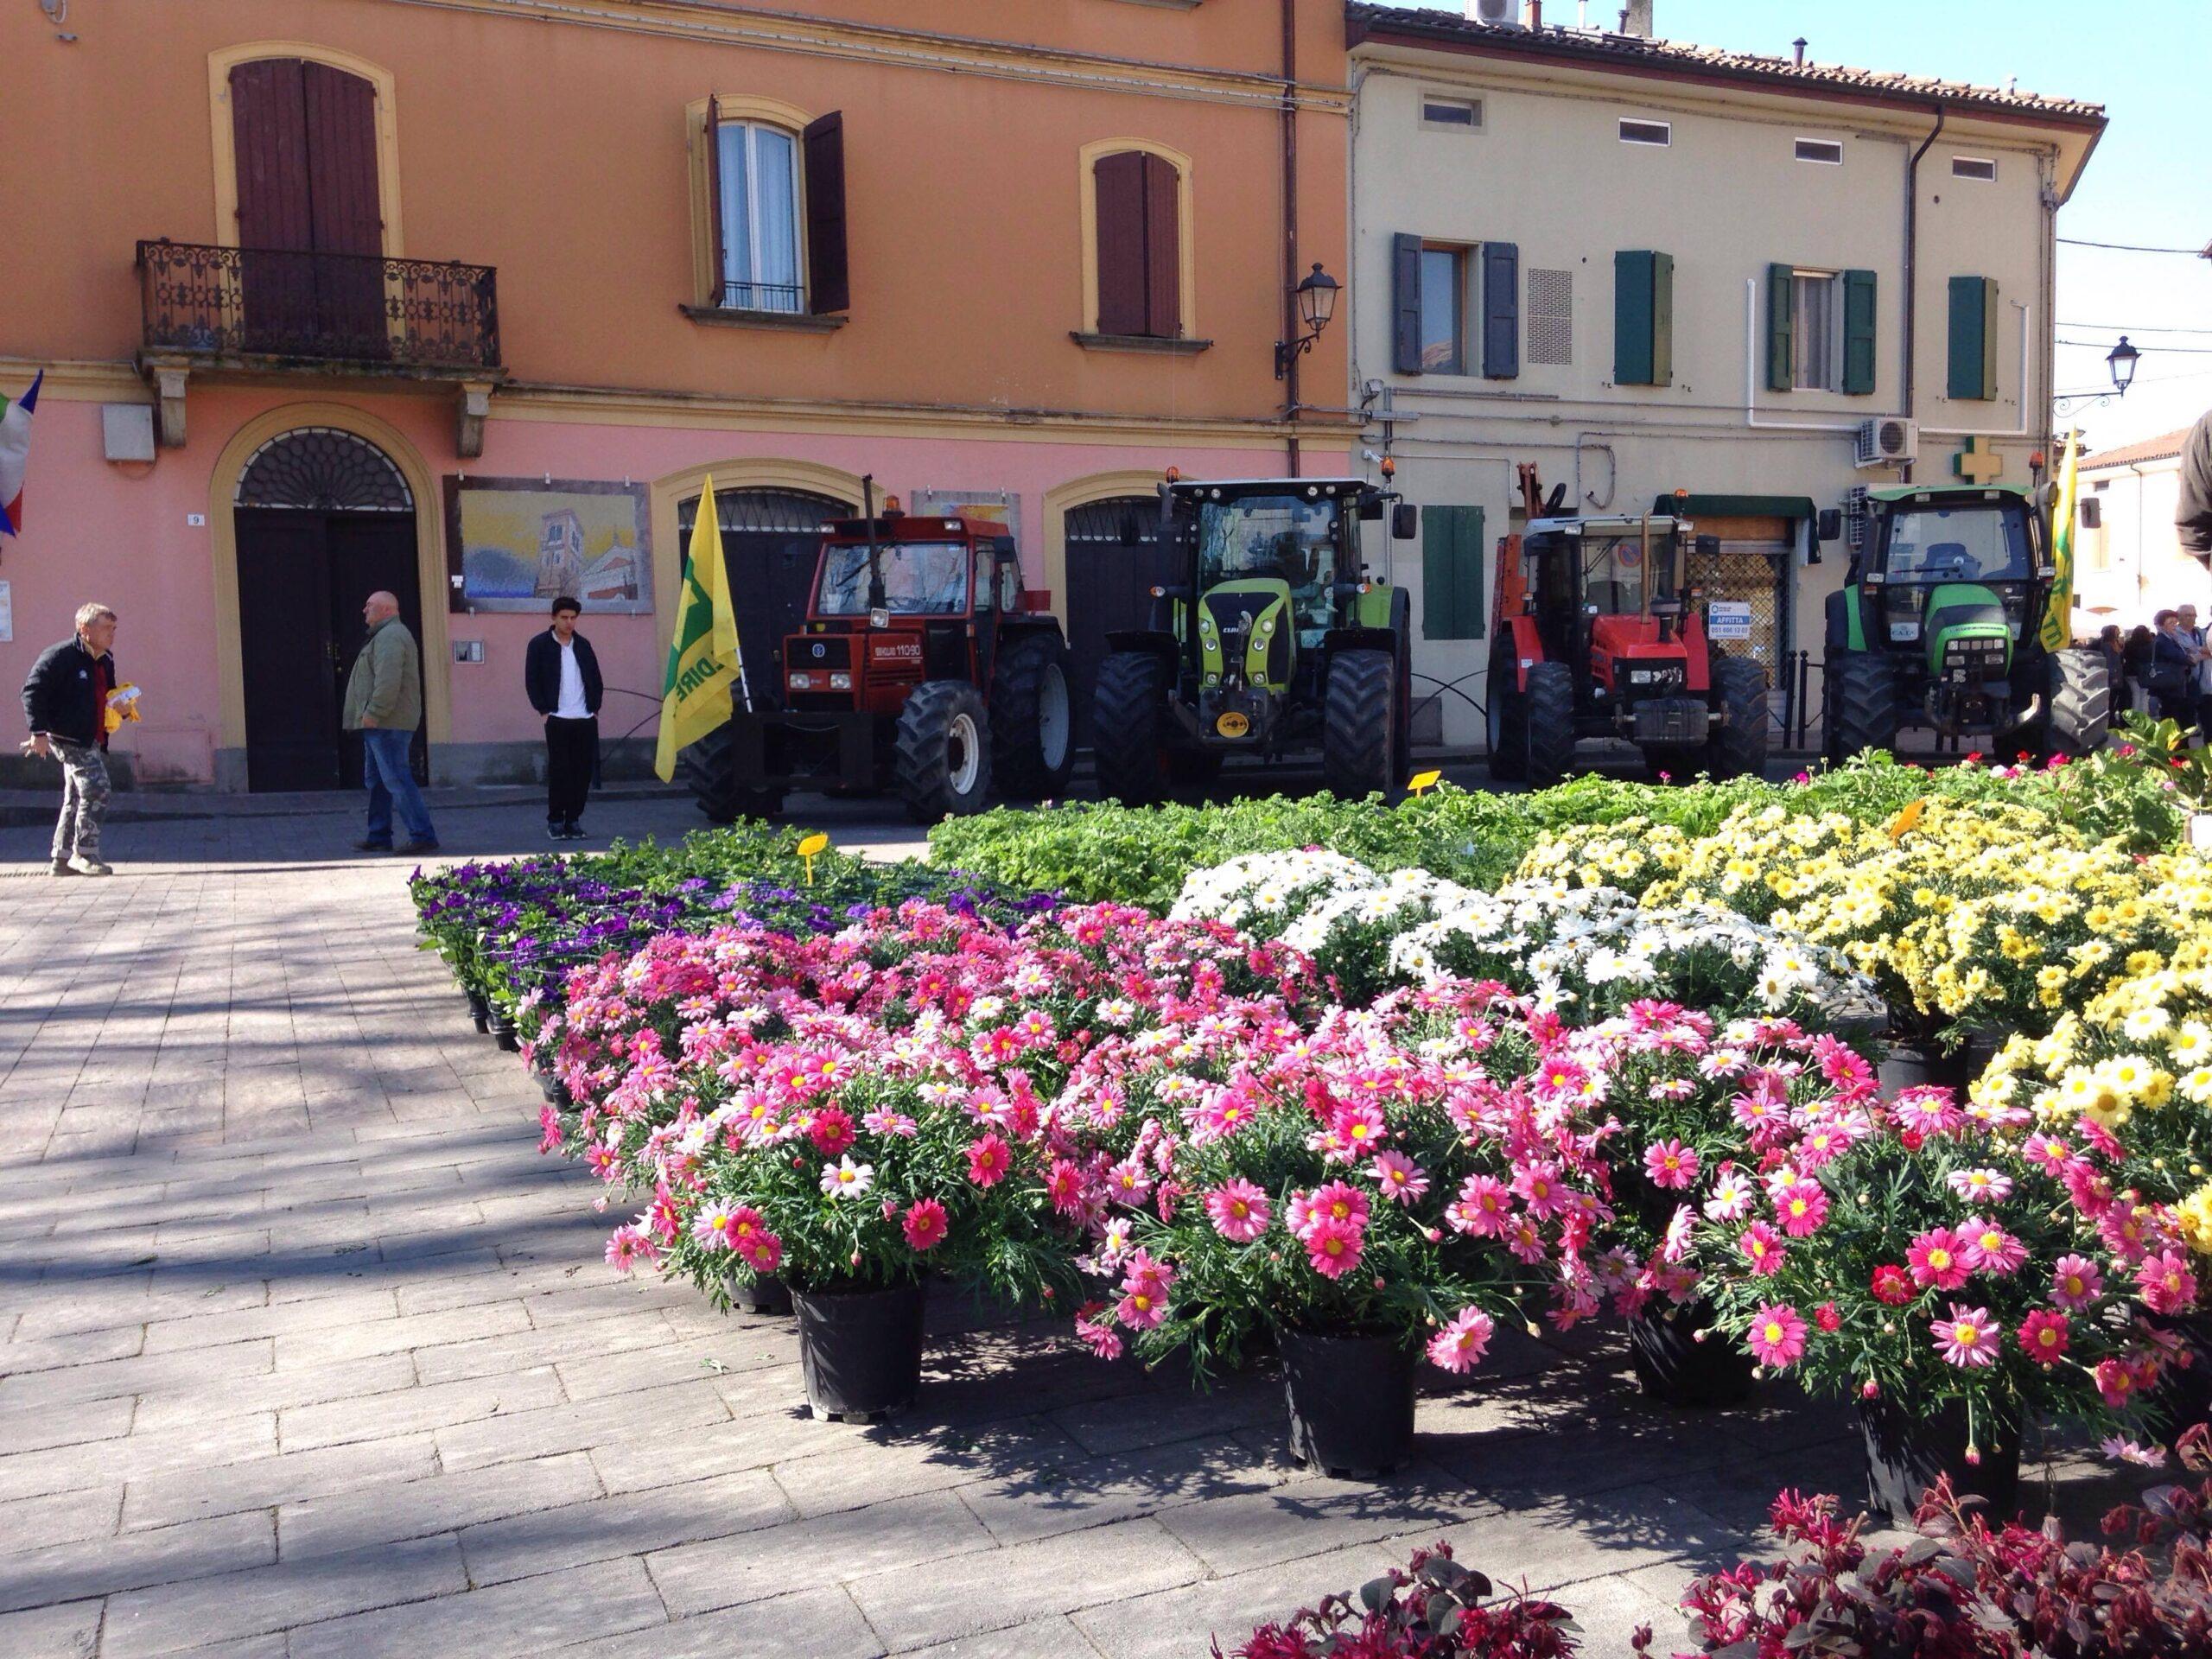 http://prolocosanpietroincasale.it/wp-content/uploads/2021/06/fiori-e-trattori-scaled.jpg